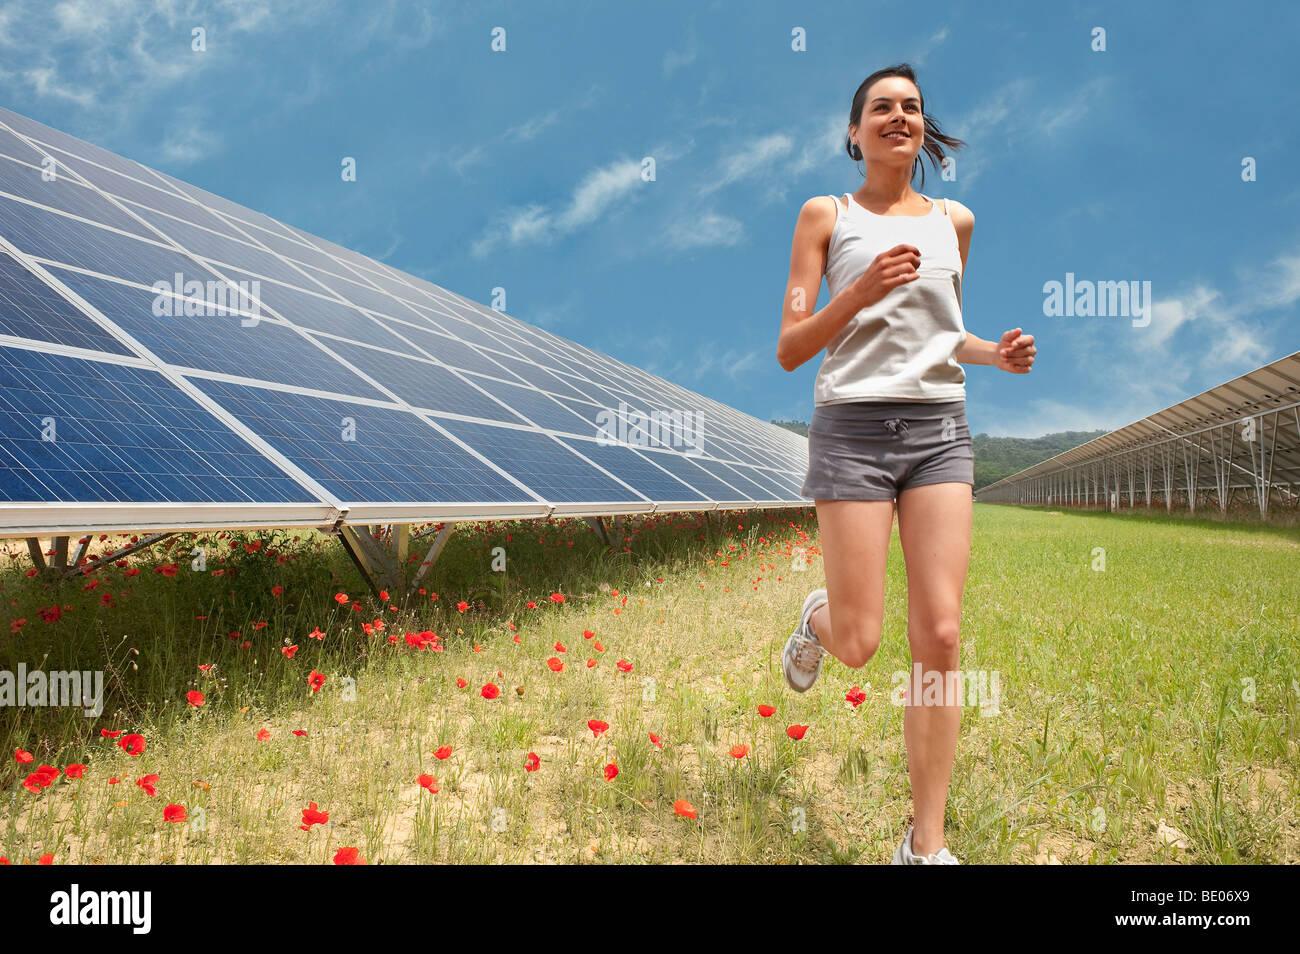 woman jogging along solar panel - Stock Image